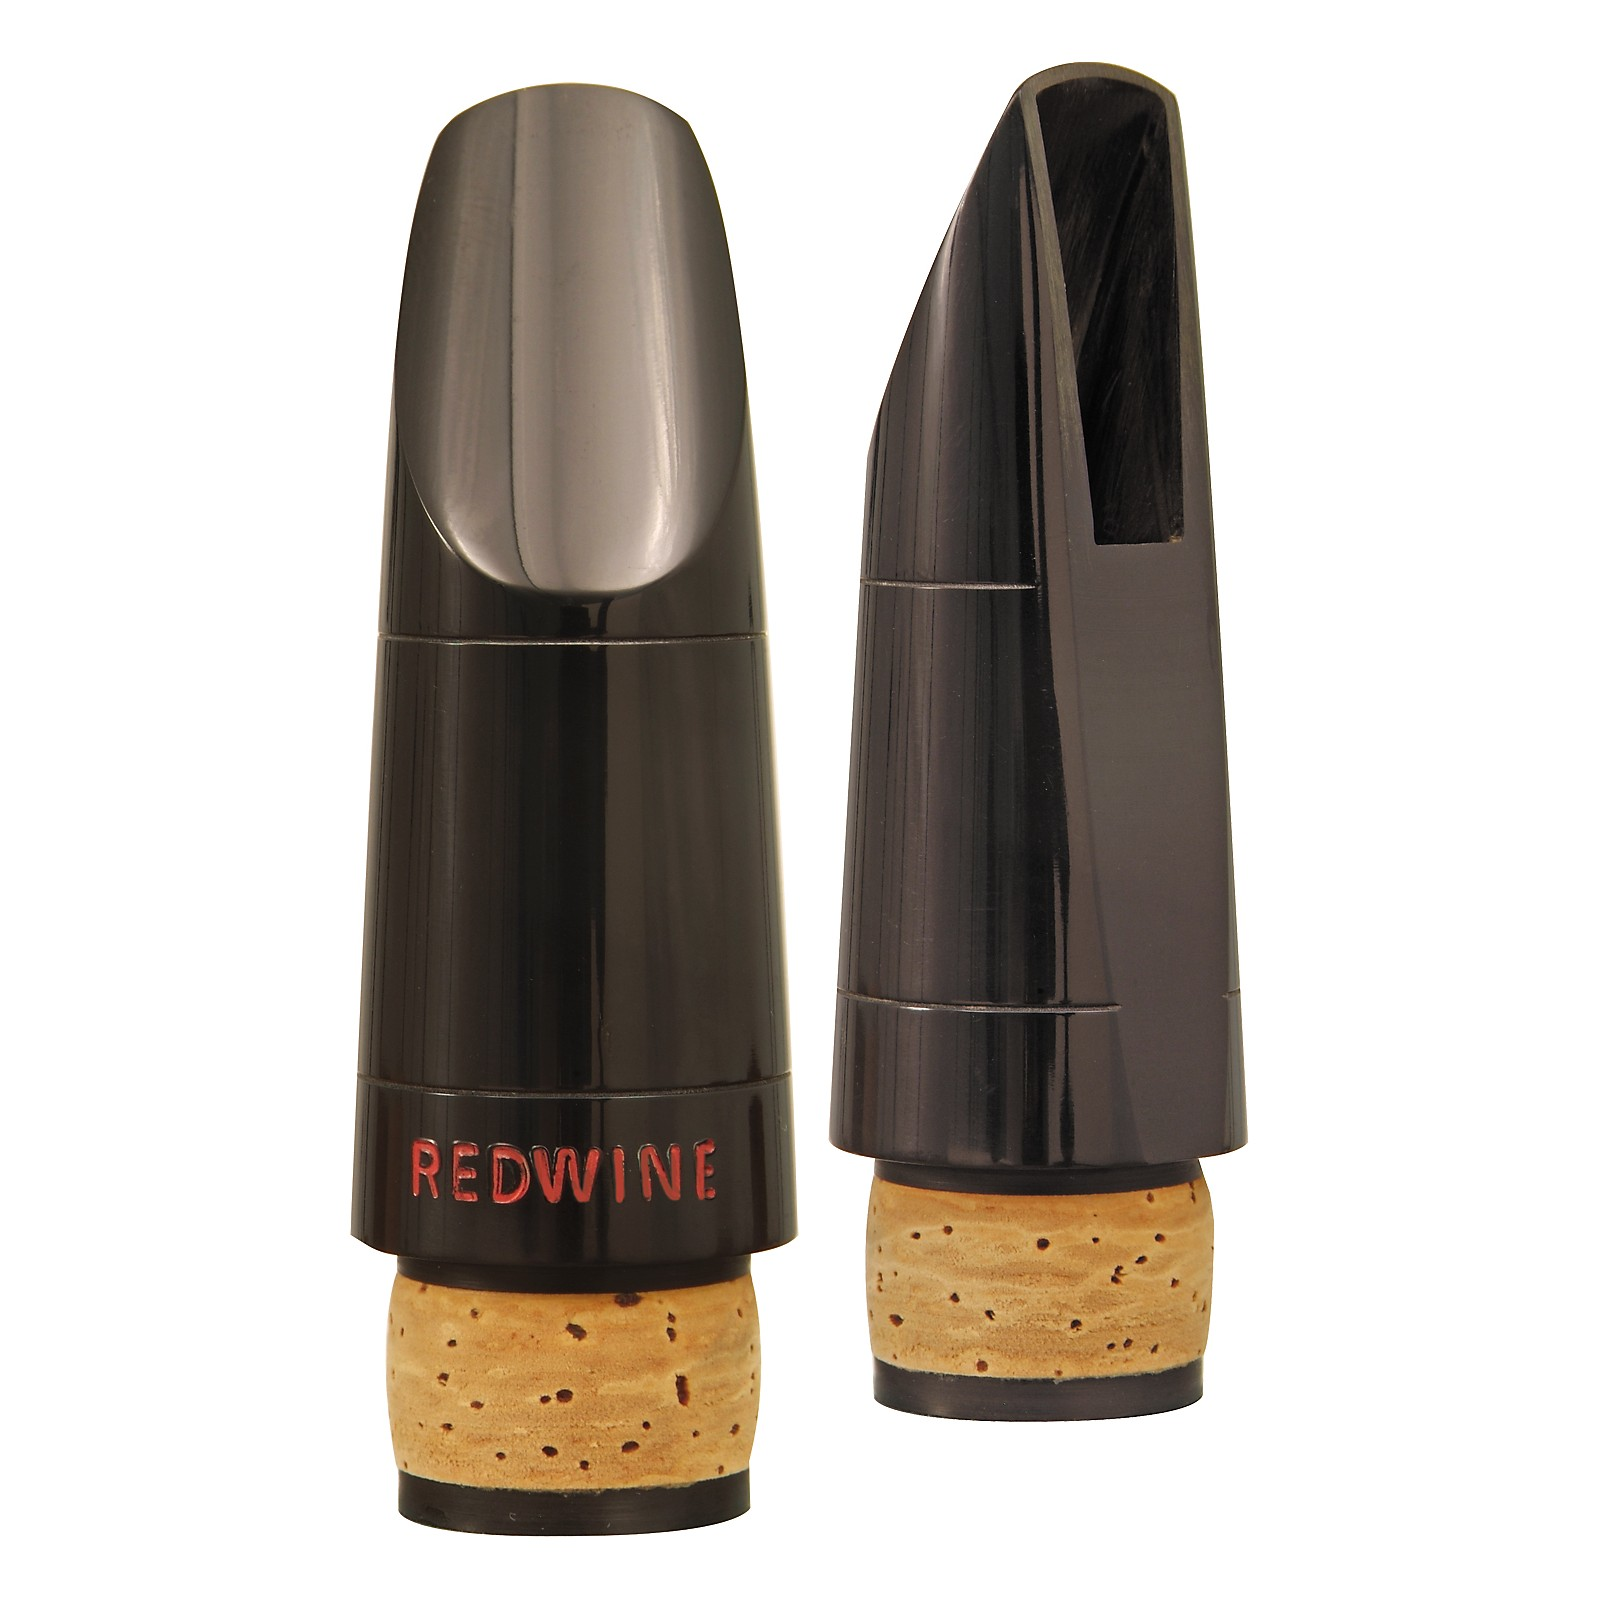 Redwine Bb Clarinet Mouthpiece